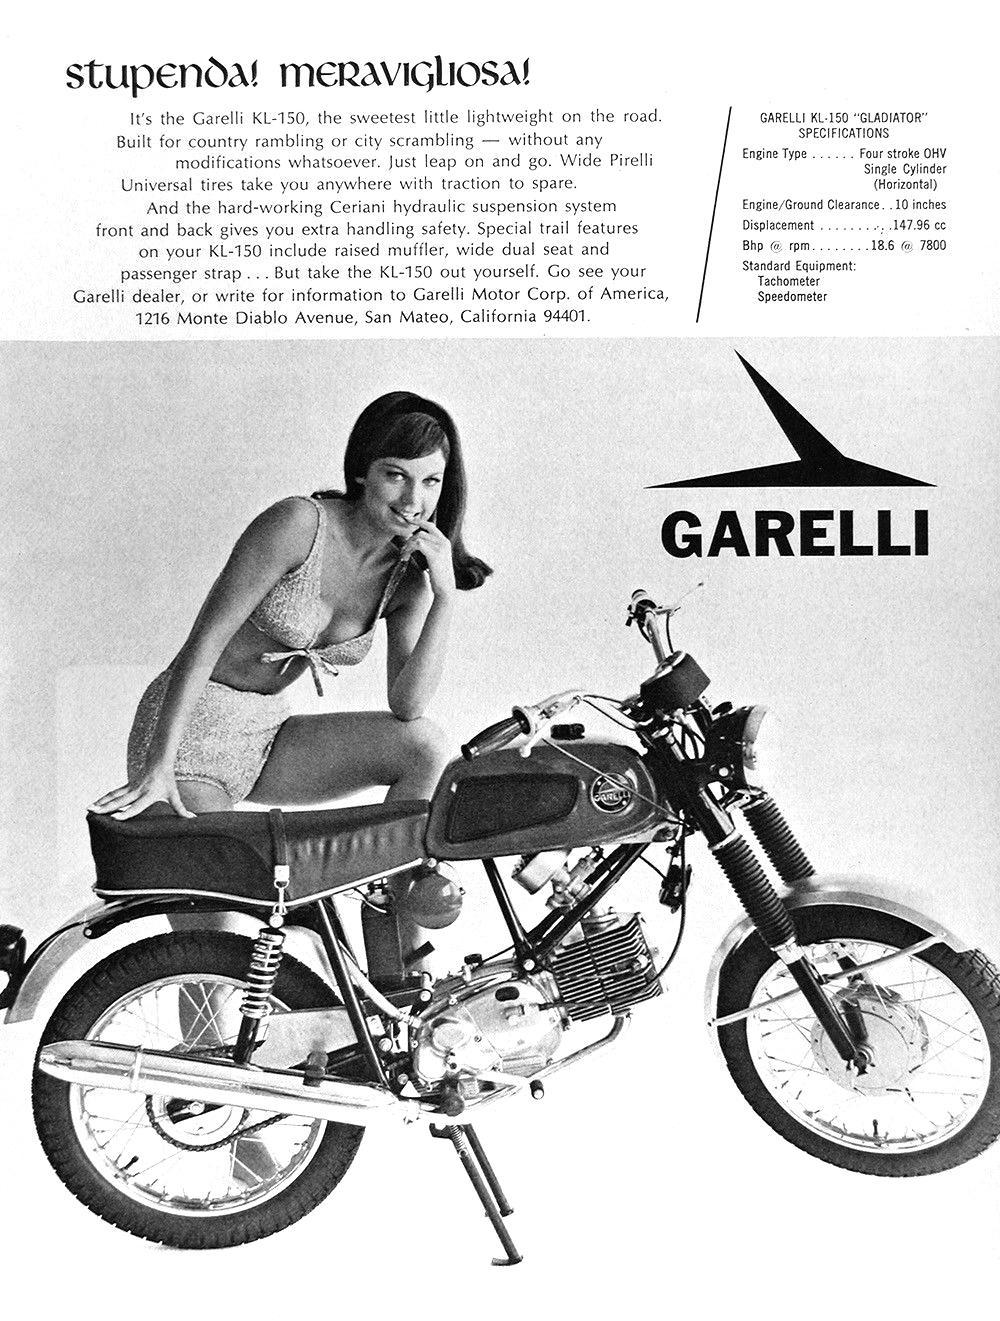 1967 Garelli KL 150 Ad